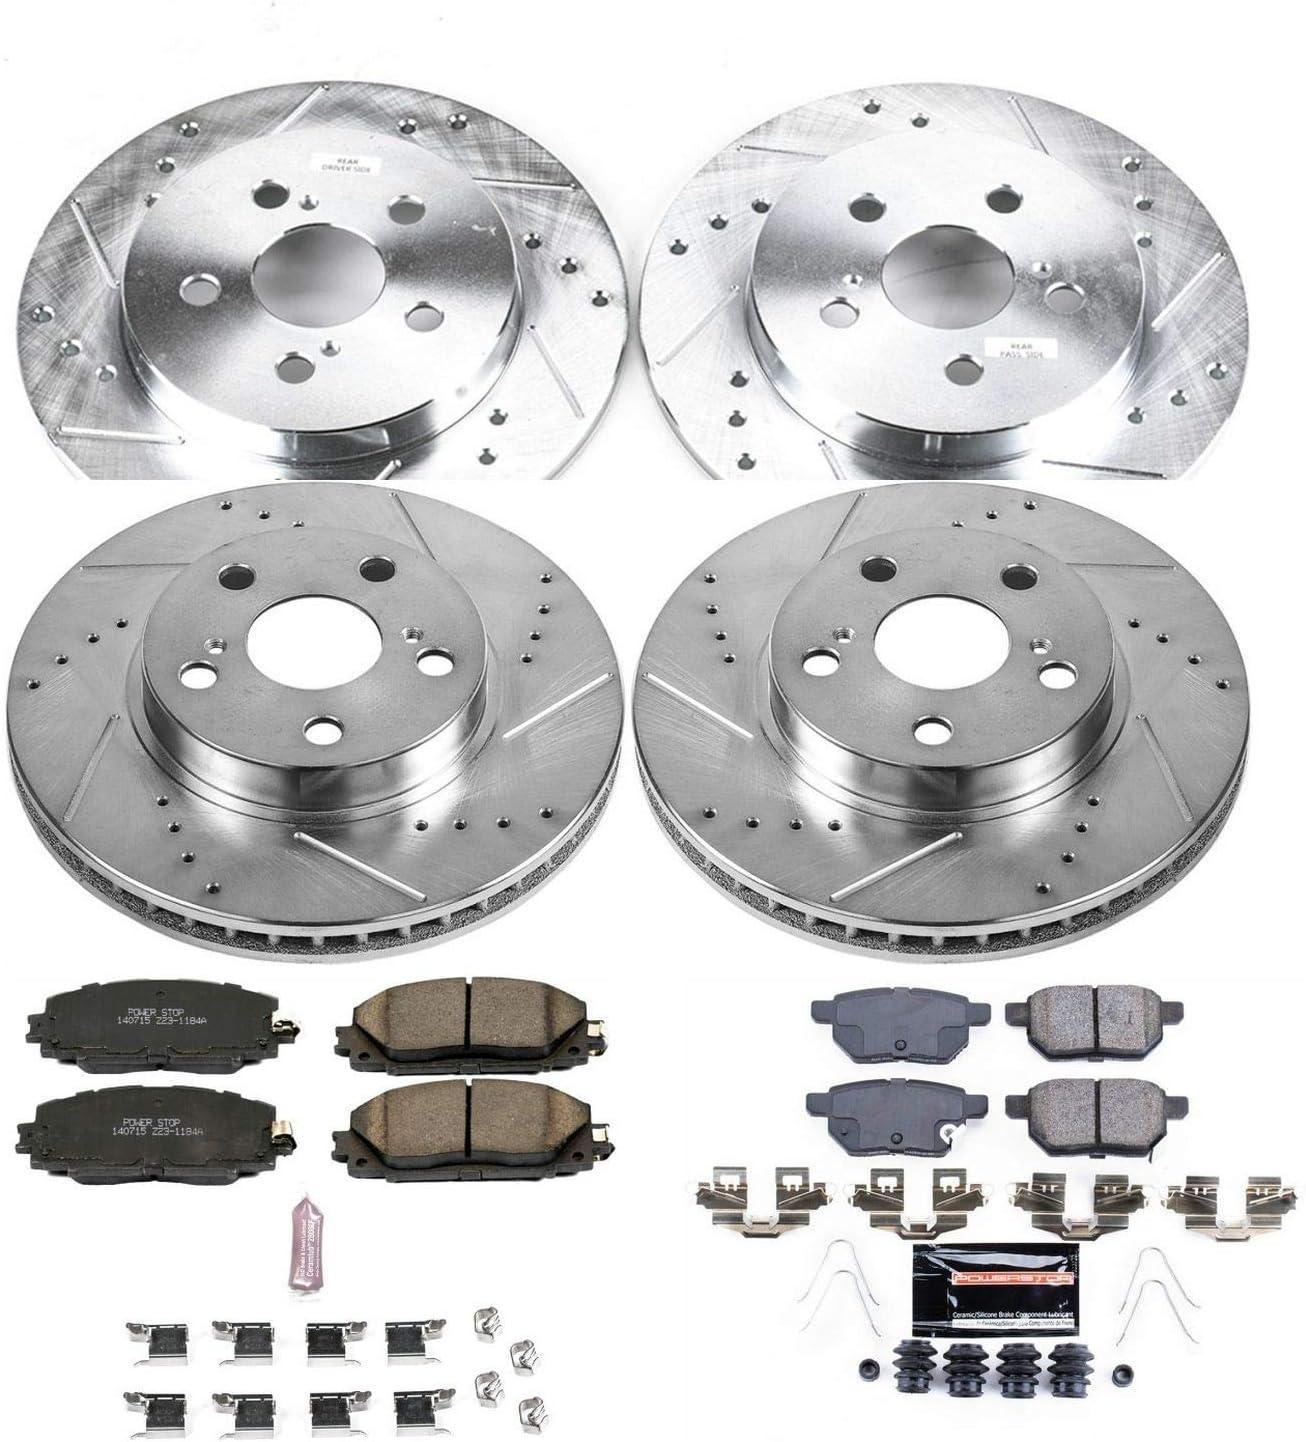 Power Stop K5871 Front /& Rear Z23 Evolution/Sport Brake Upgrade Kit